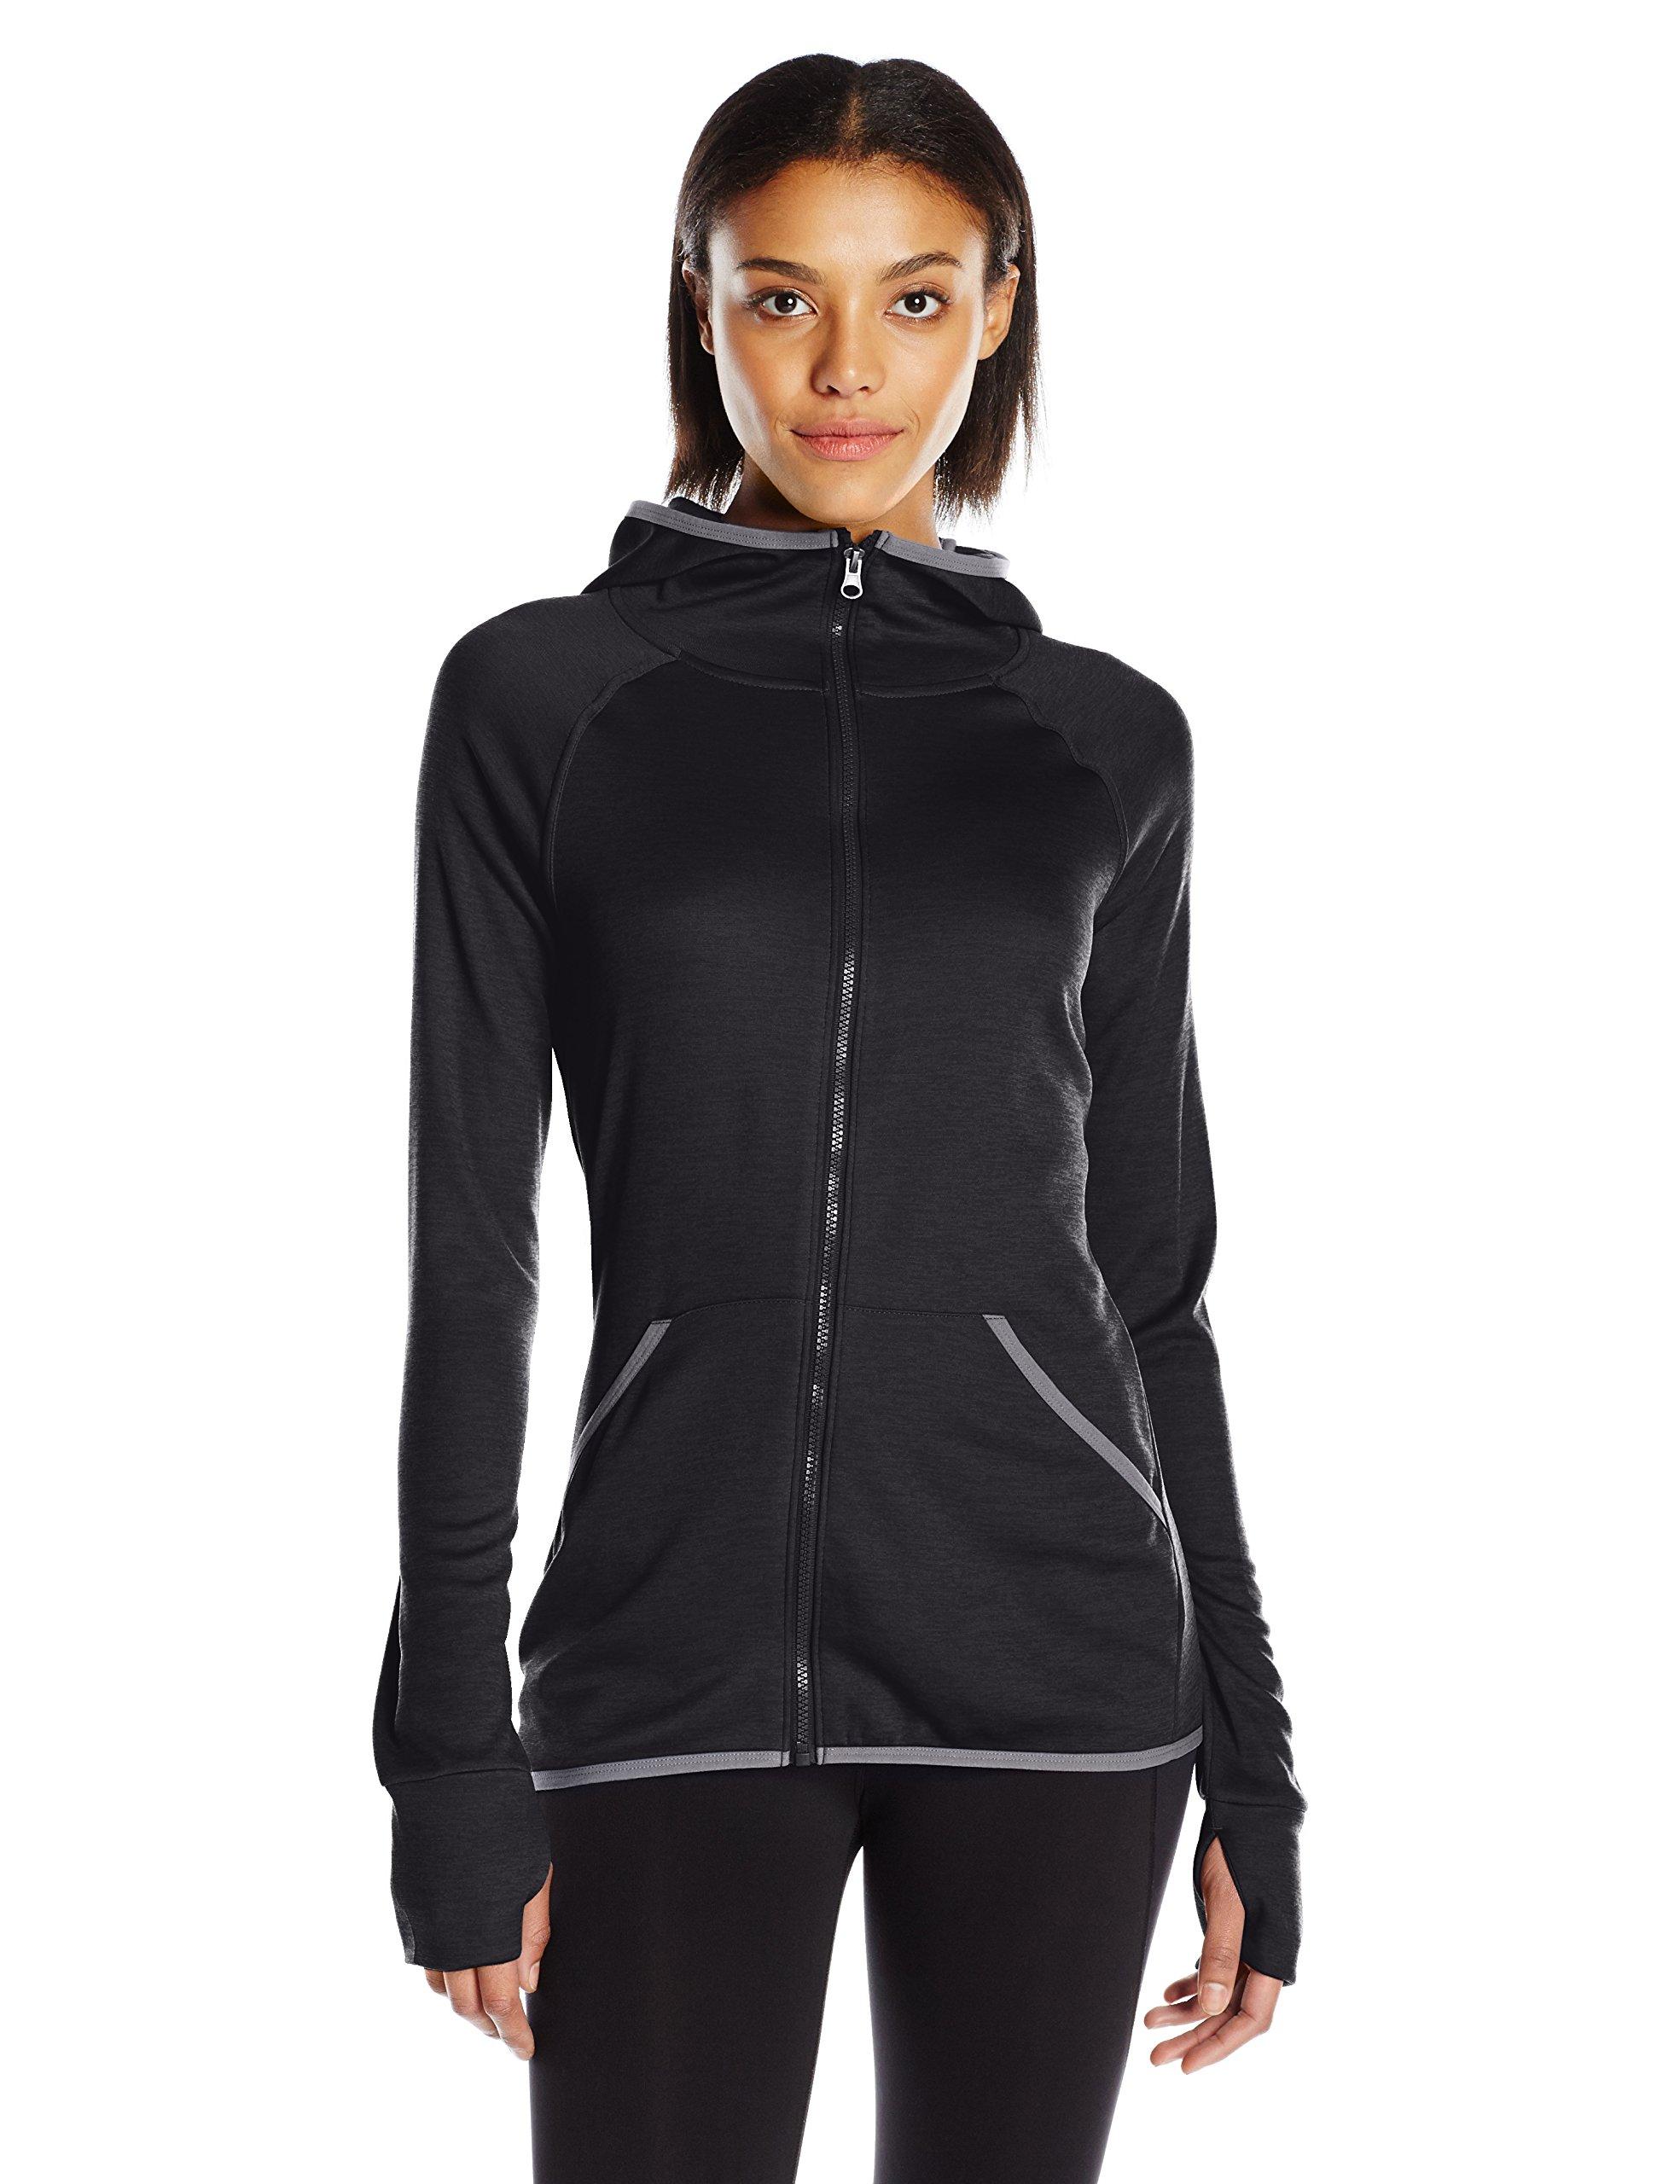 Hanes Women's Sport Performance Fleece Full Zip Hoodie, Black Heather/Dada Grey Binding, L by Hanes